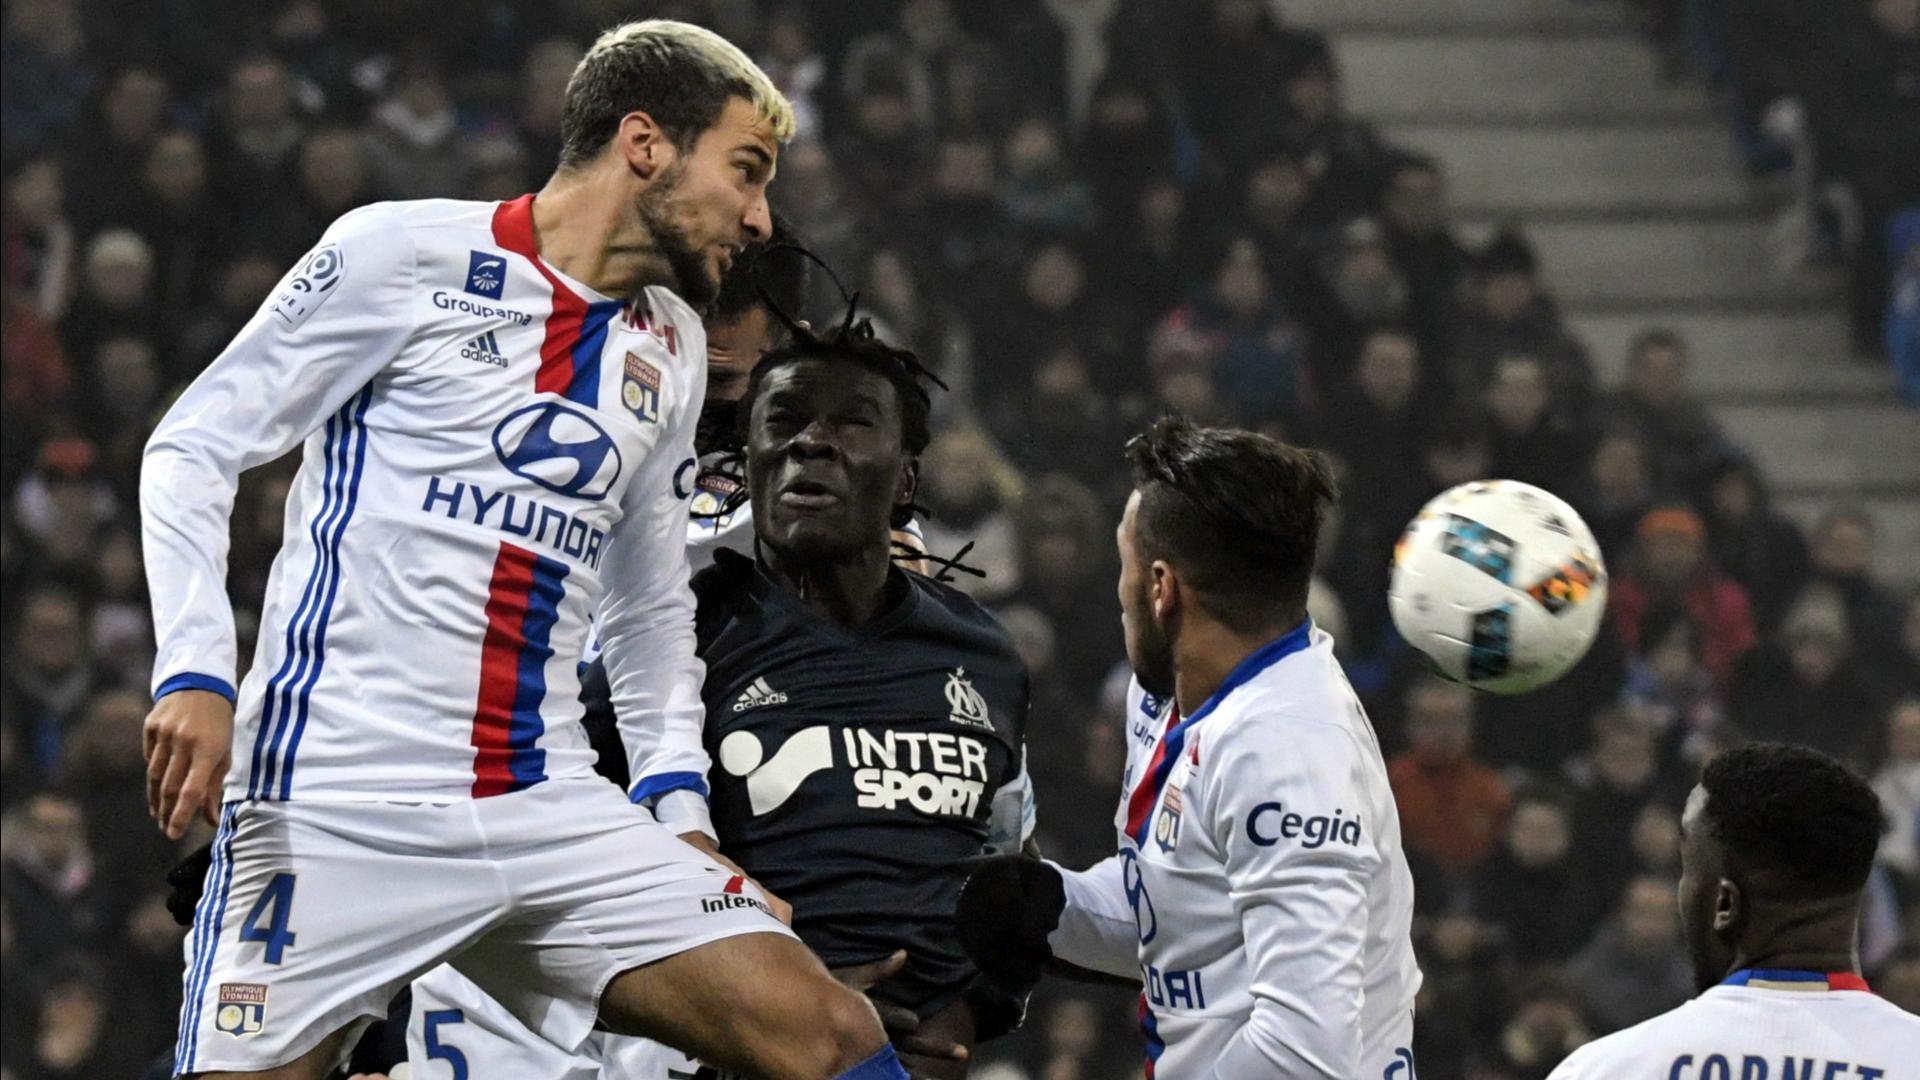 Emanuel Mammana Olympique Lyonnais Ligue 1 2016-17